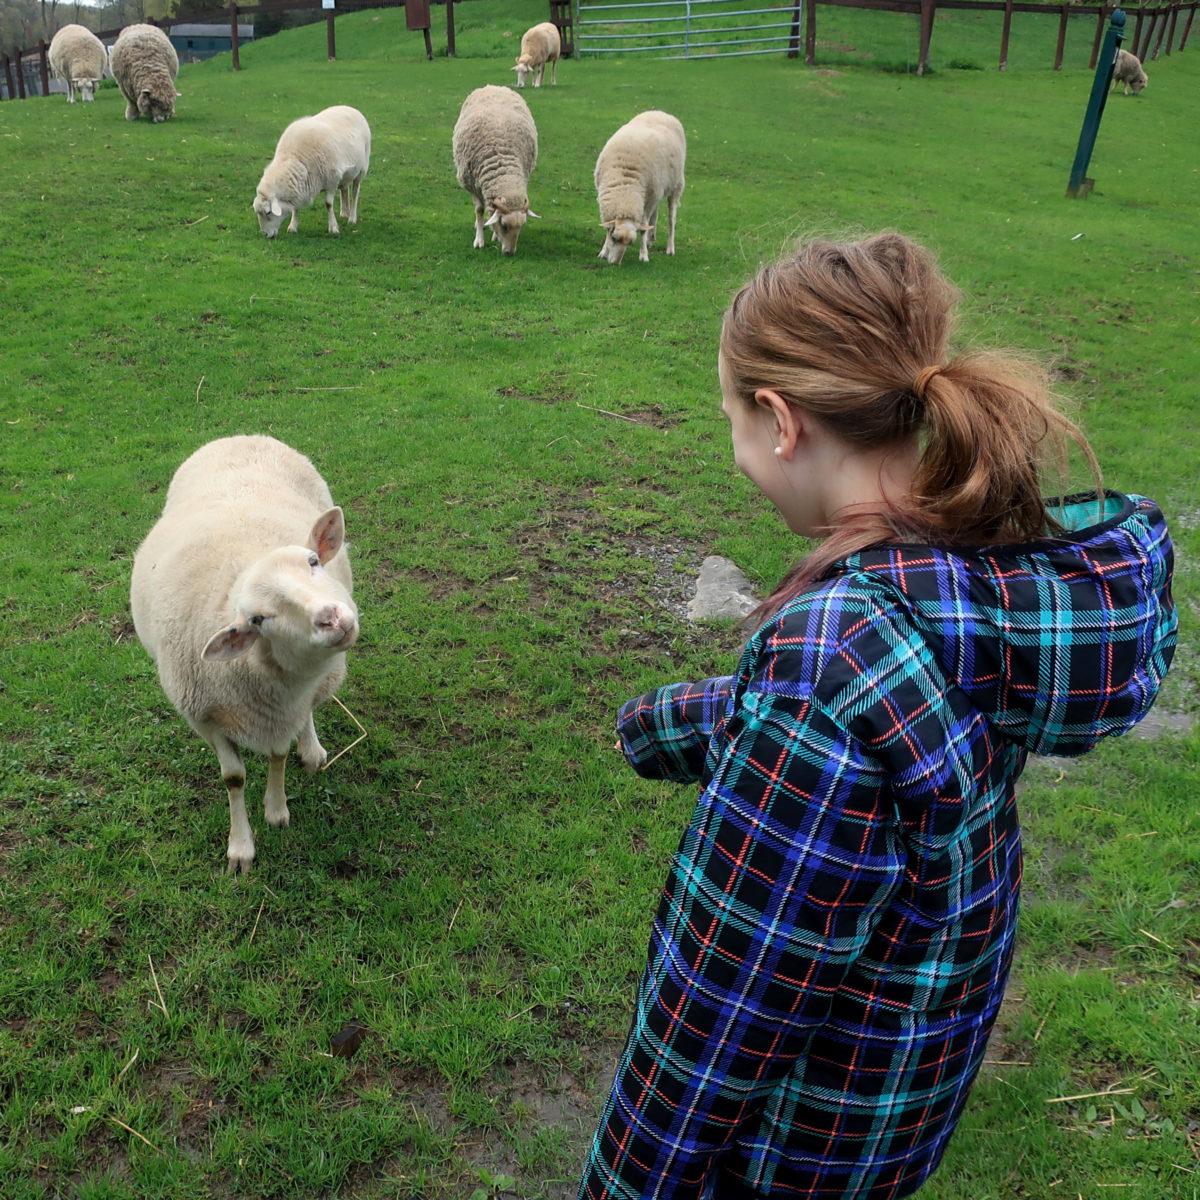 Catskill Animal Sanctuary, Saugerties, NY – A Nation of Moms